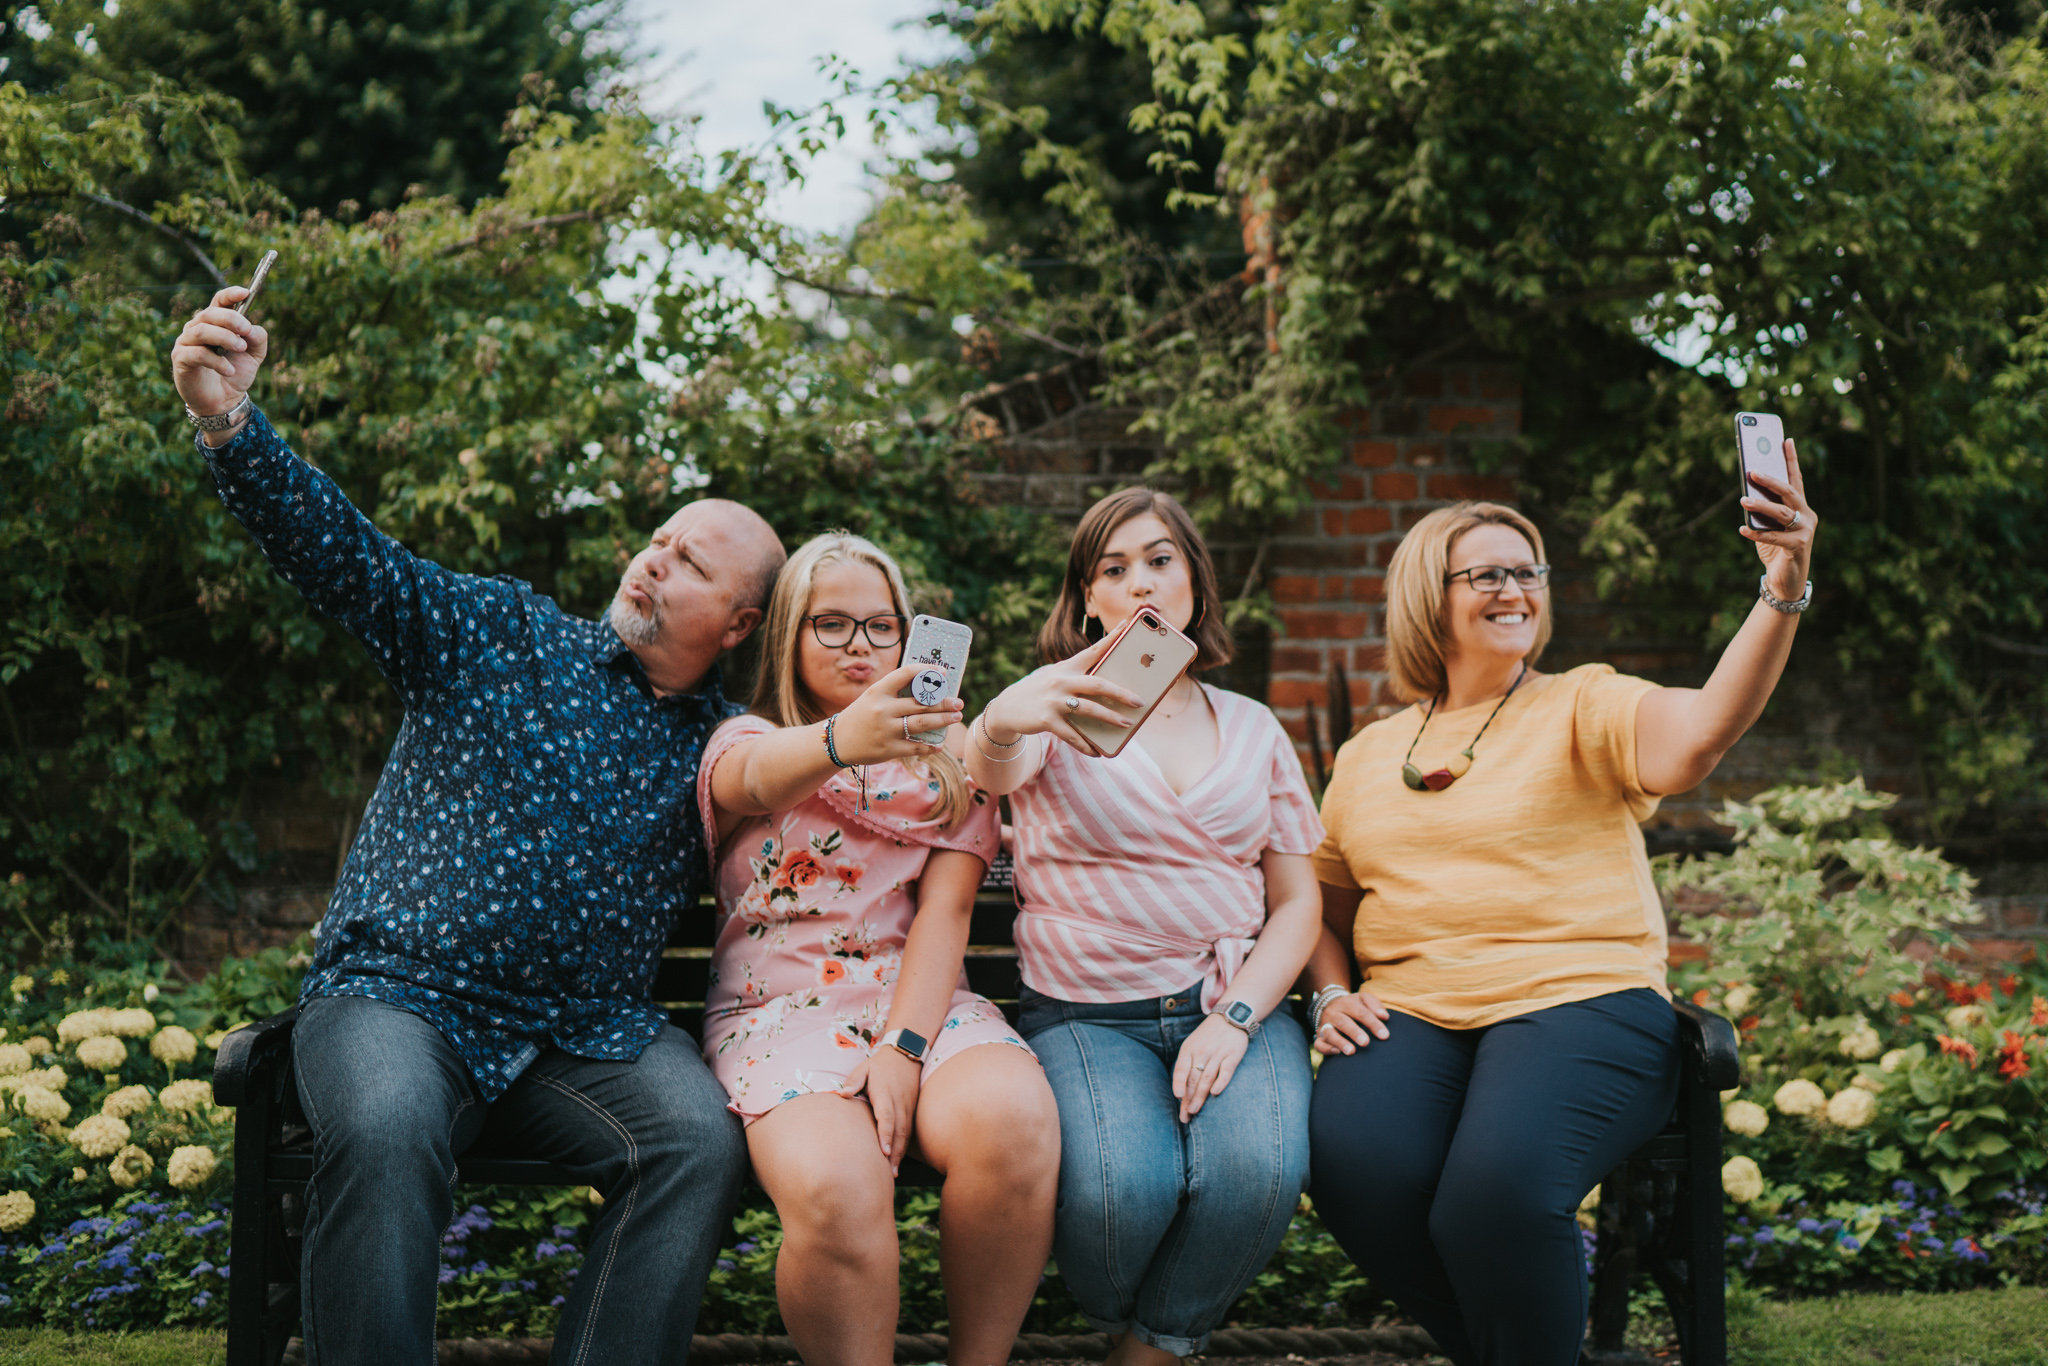 Fitch-Family-Colchester-Castle-Park-Grace-Elizabeth-Alternative-Wedding-Lifestyle-Photographer-Colchester-Essex-Suffolk-Norfolk-Devon (34 of 41).jpg